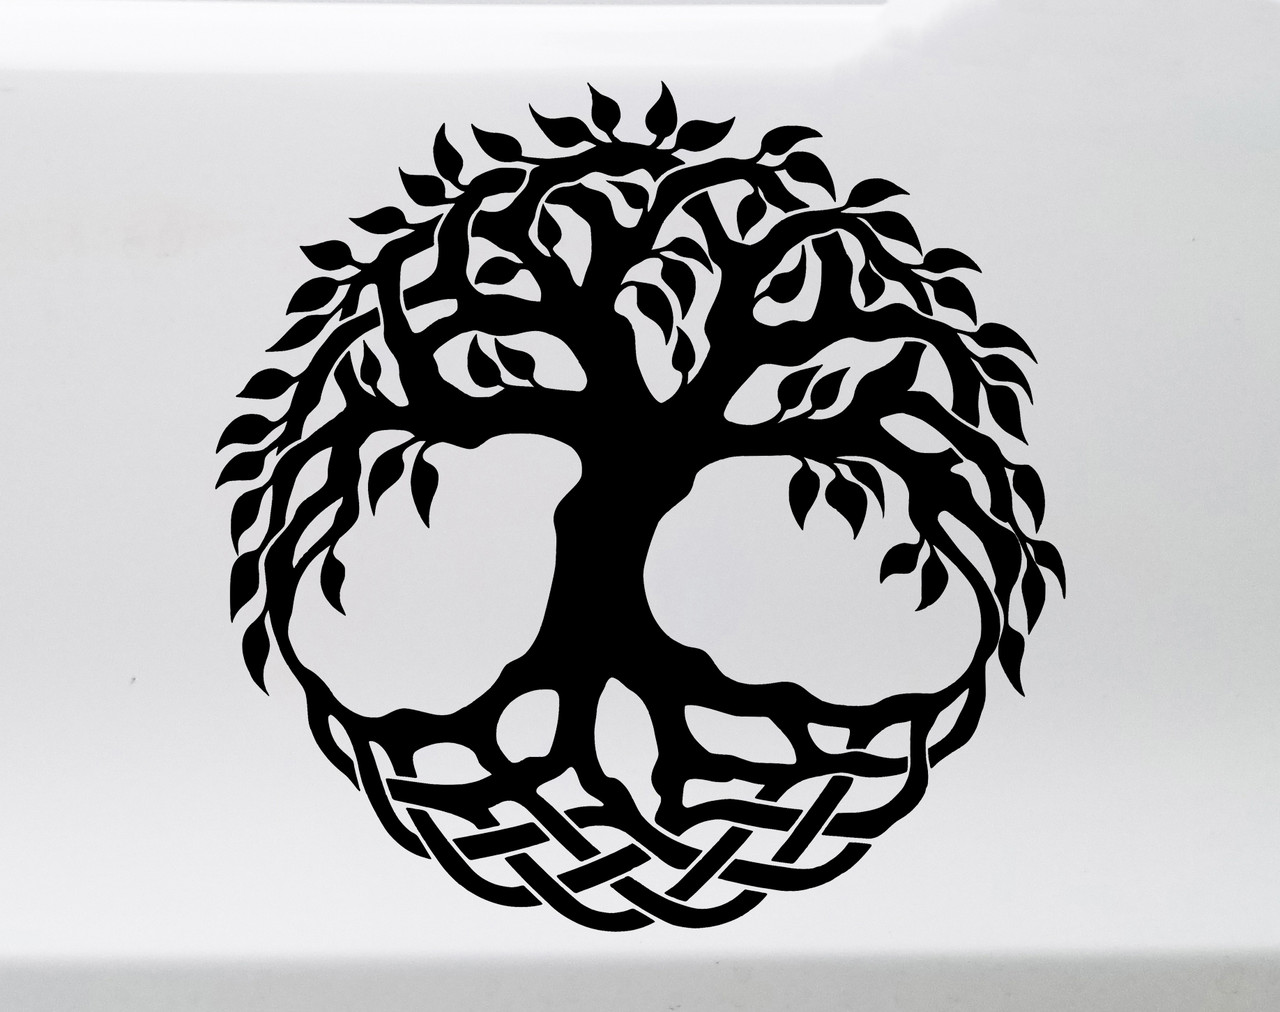 Tree of Life Yggdrasil Vinyl Decal - Norse Mythology - Die Cut Sticker